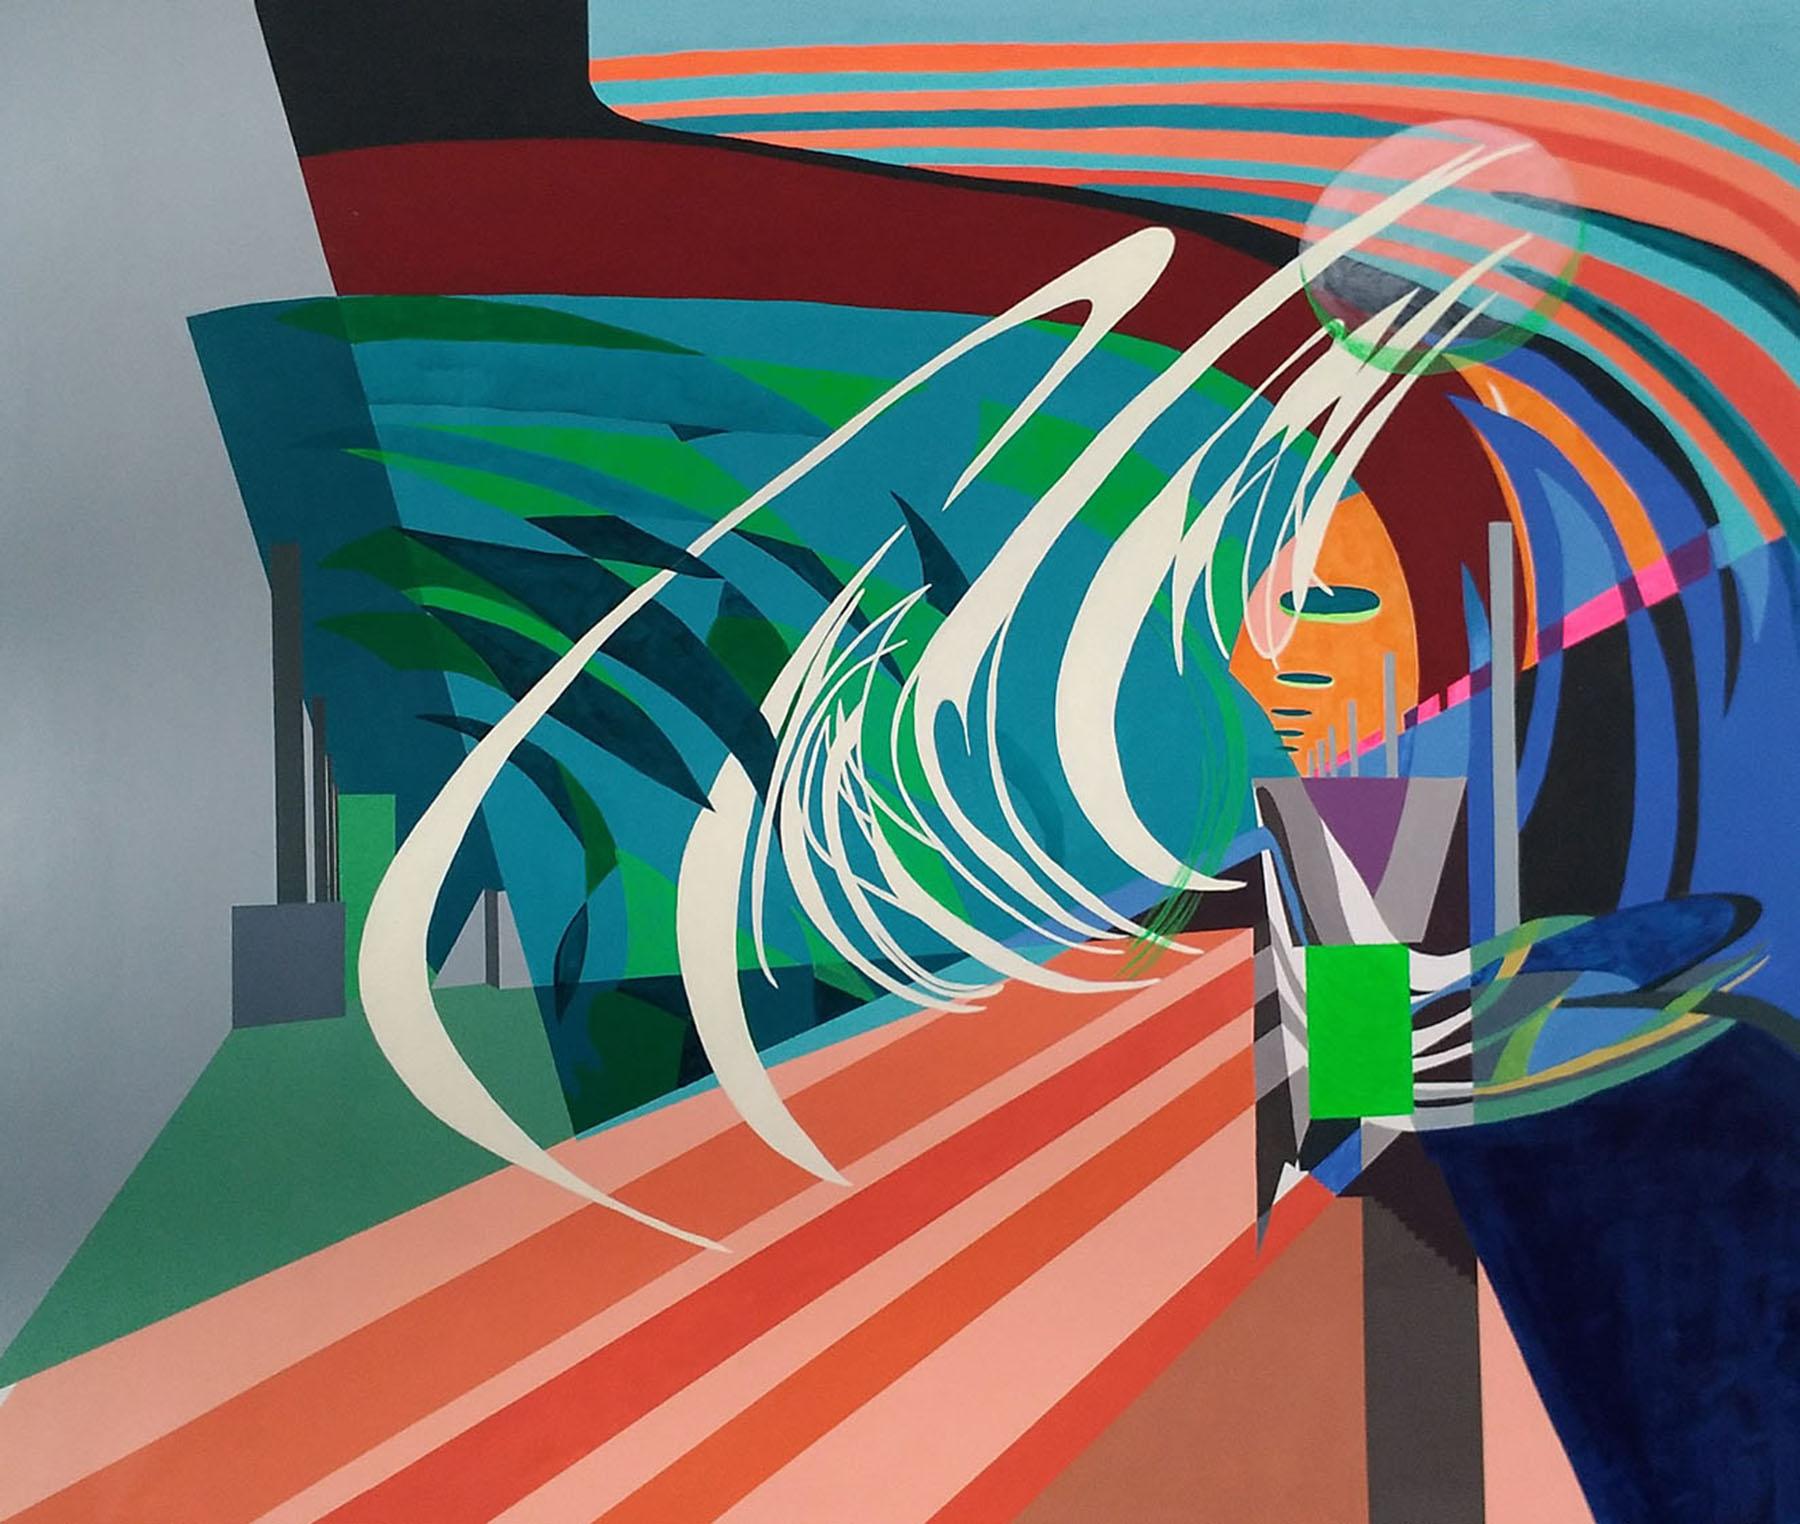 'Imagen multifocal 4' Paula Nahmod Acrylic on canvas, 90 x 110 cm, 2017